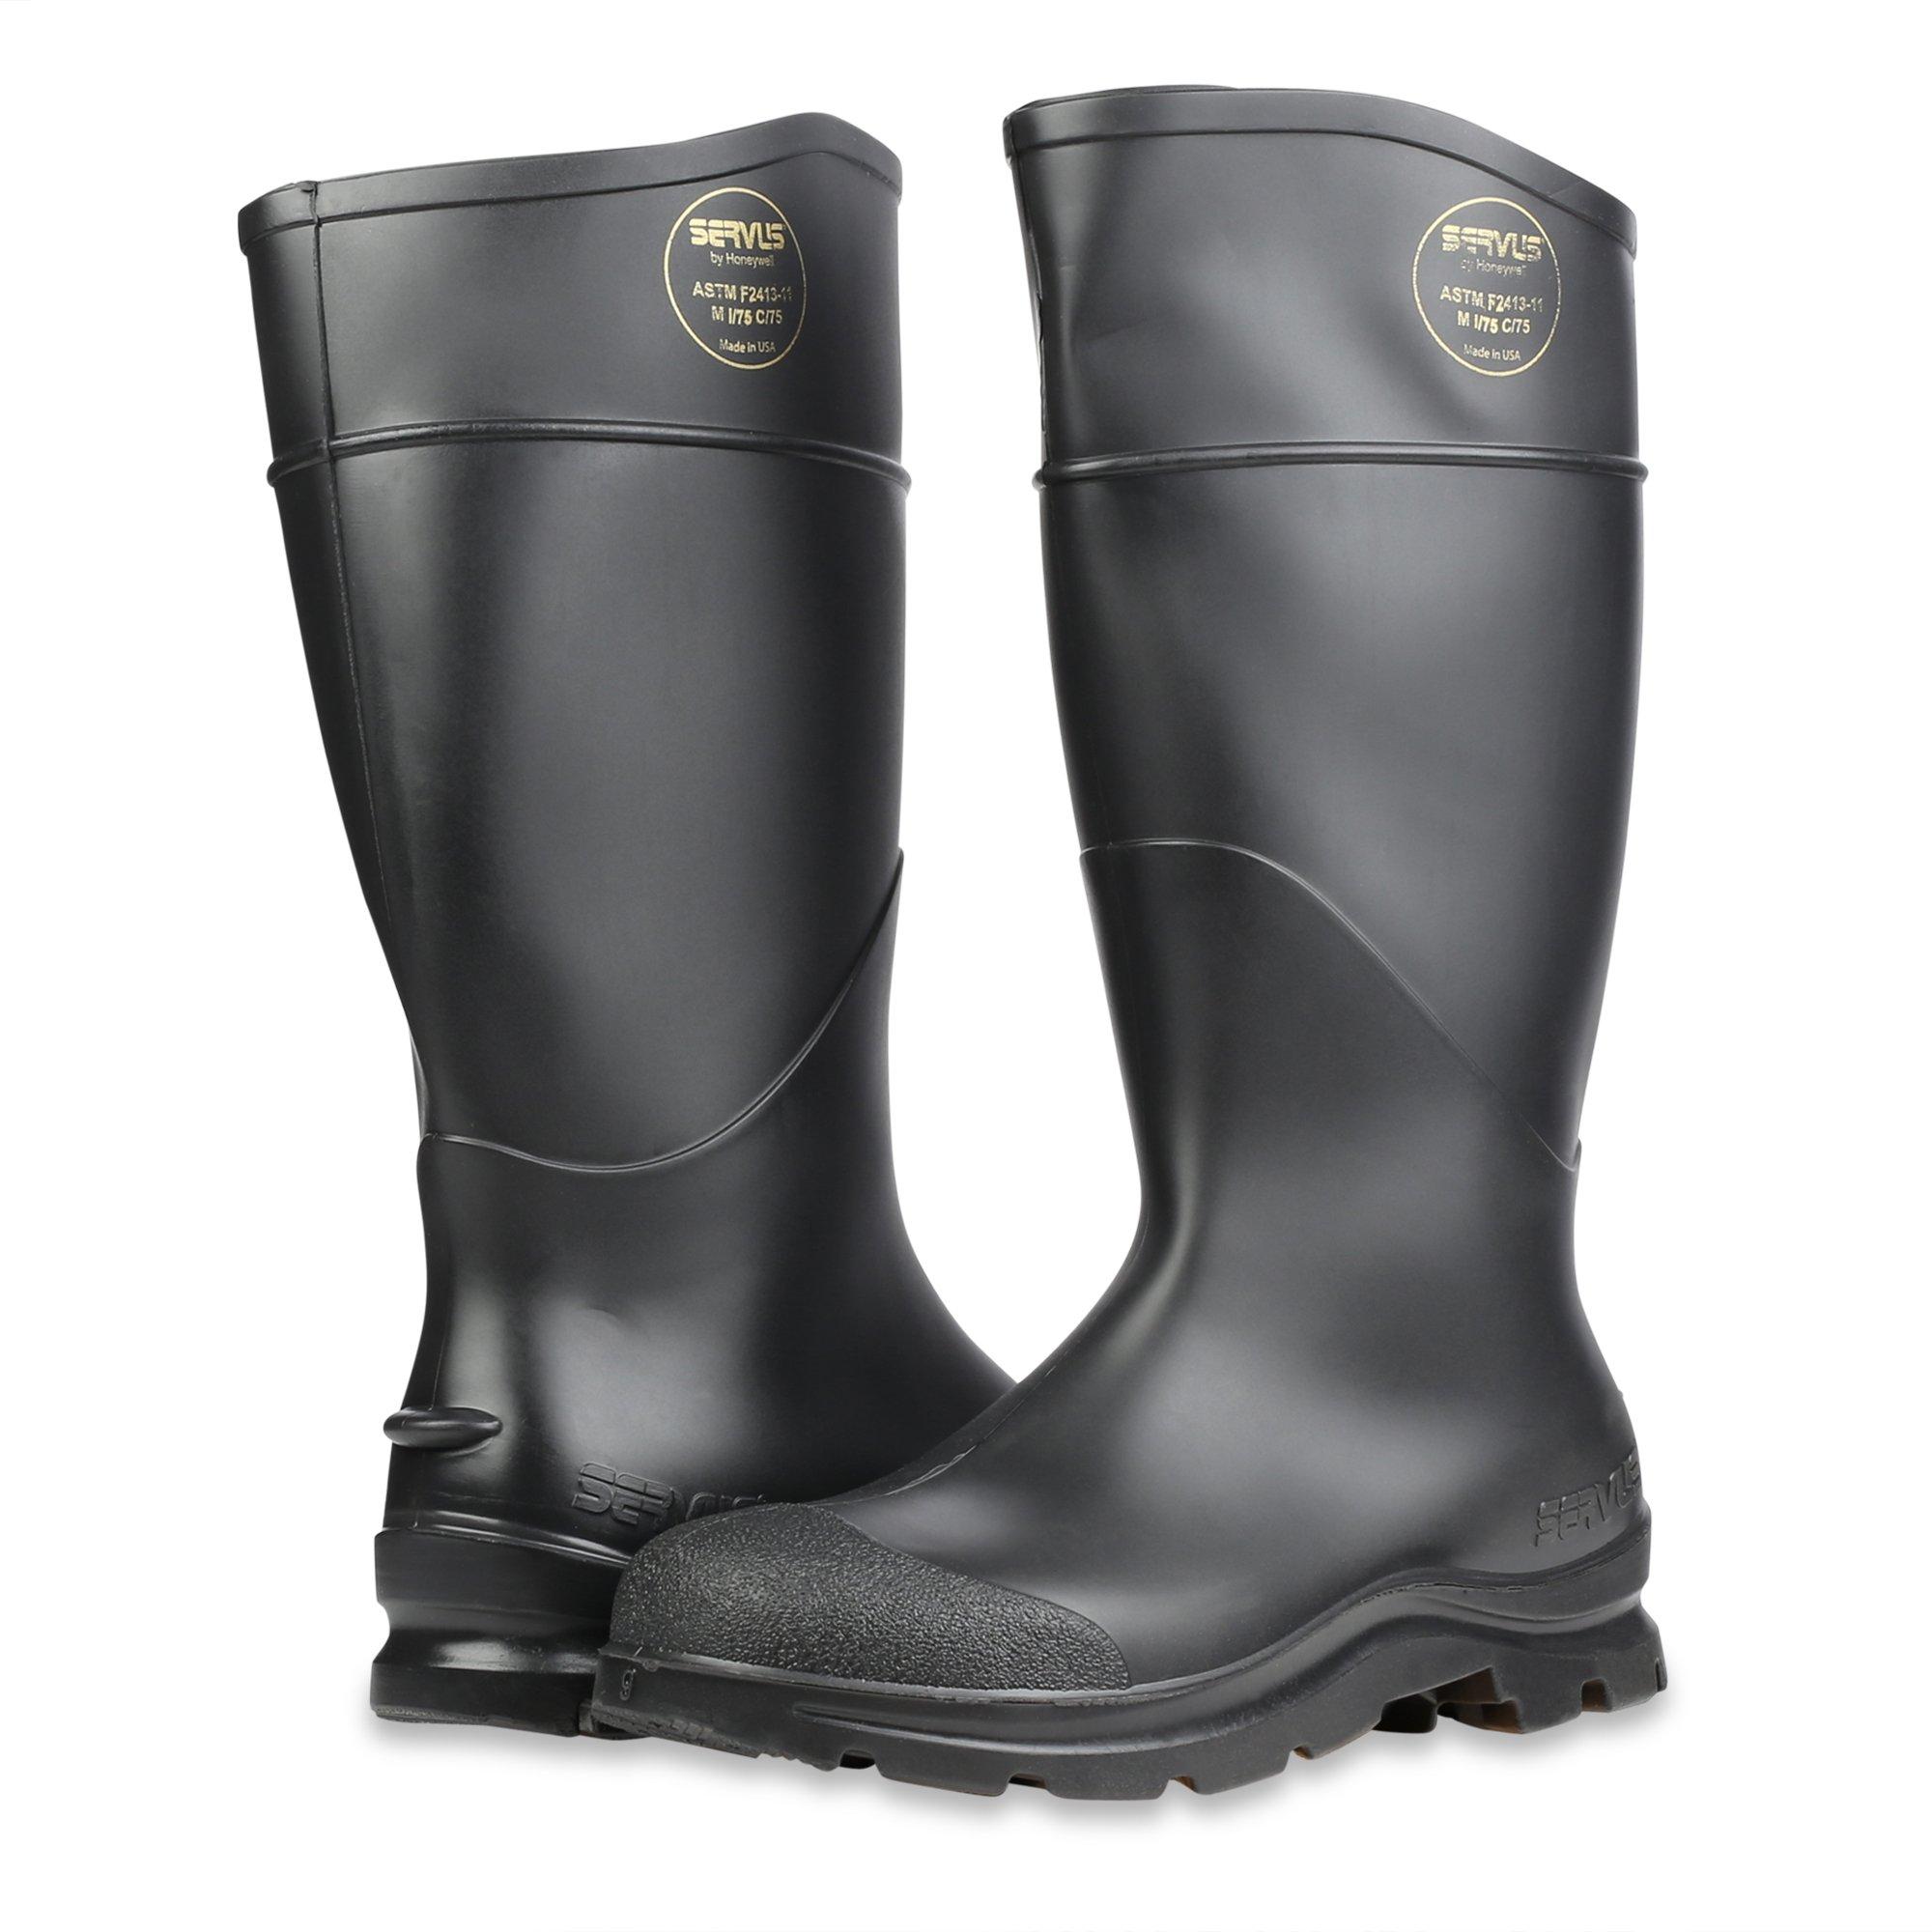 Servus Comfort Technology 14'' PVC Steel Toe Men's Work Boots, Black, Size 10 (18821) by Servus (Image #6)